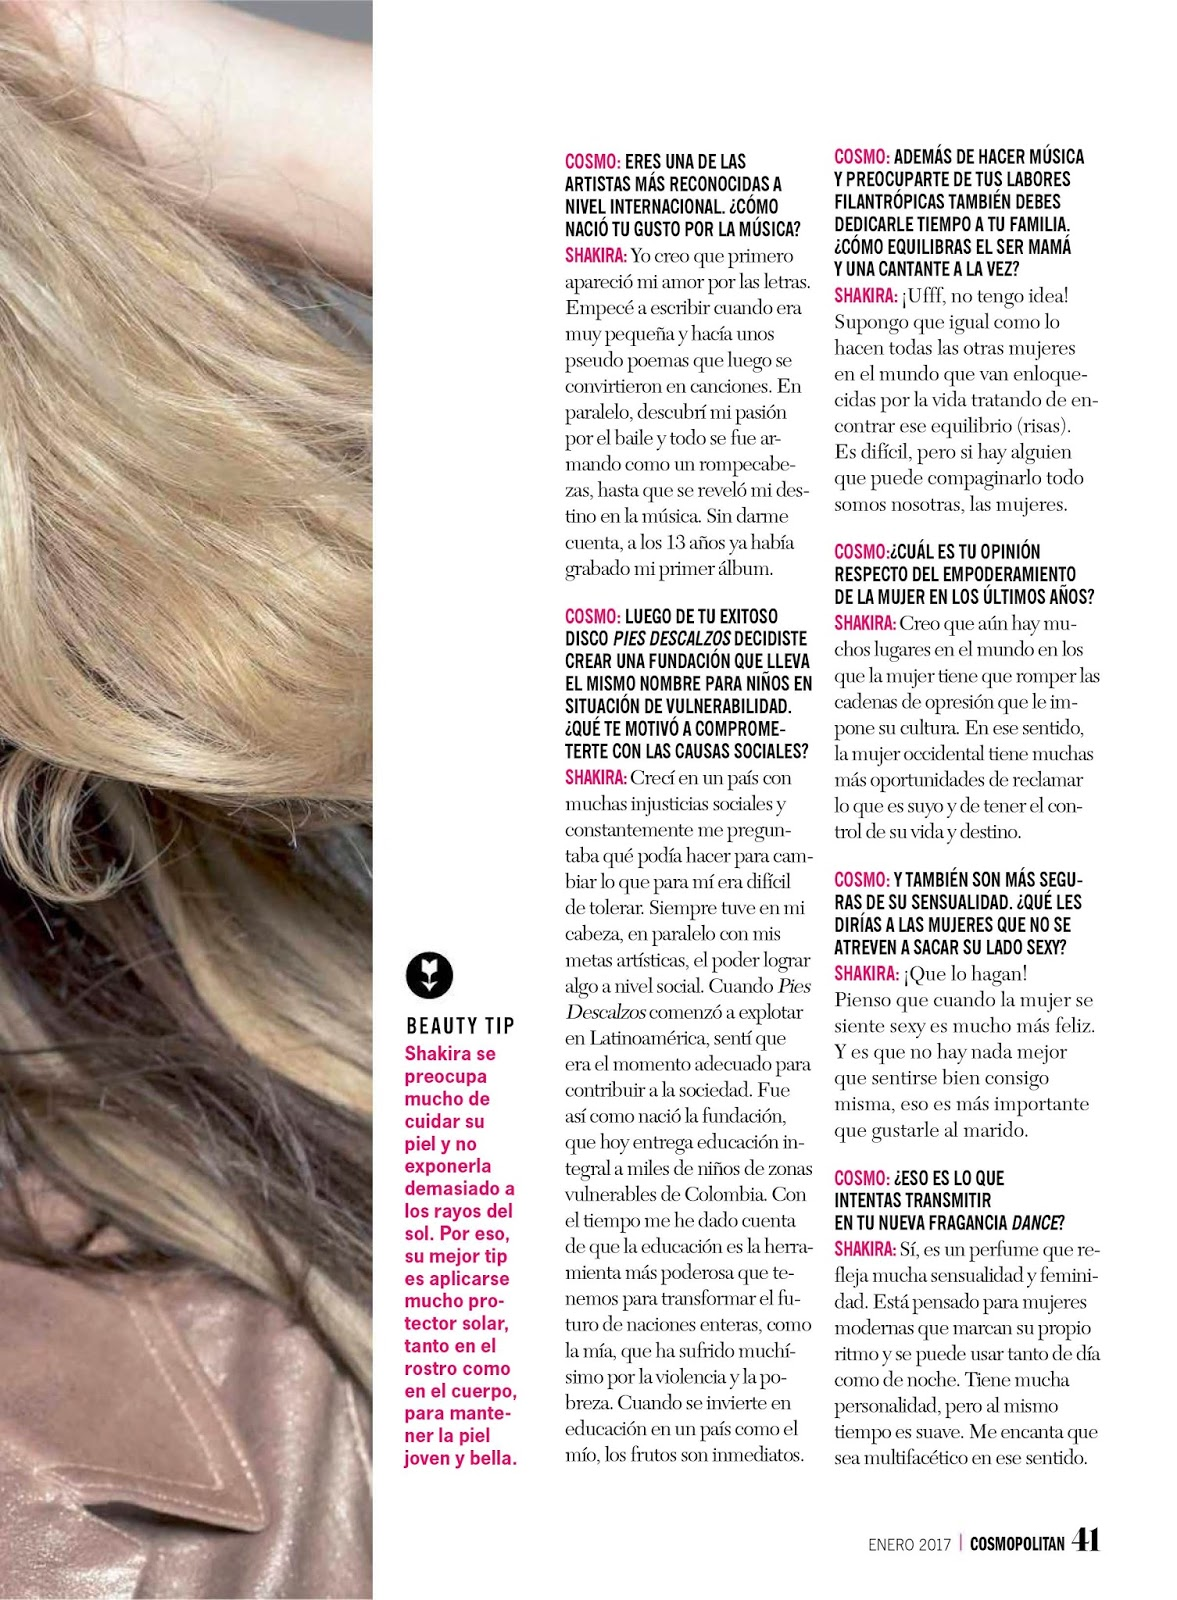 Shakira en la portada de la revista Cosmopolitan de Chile (Enero 2017)